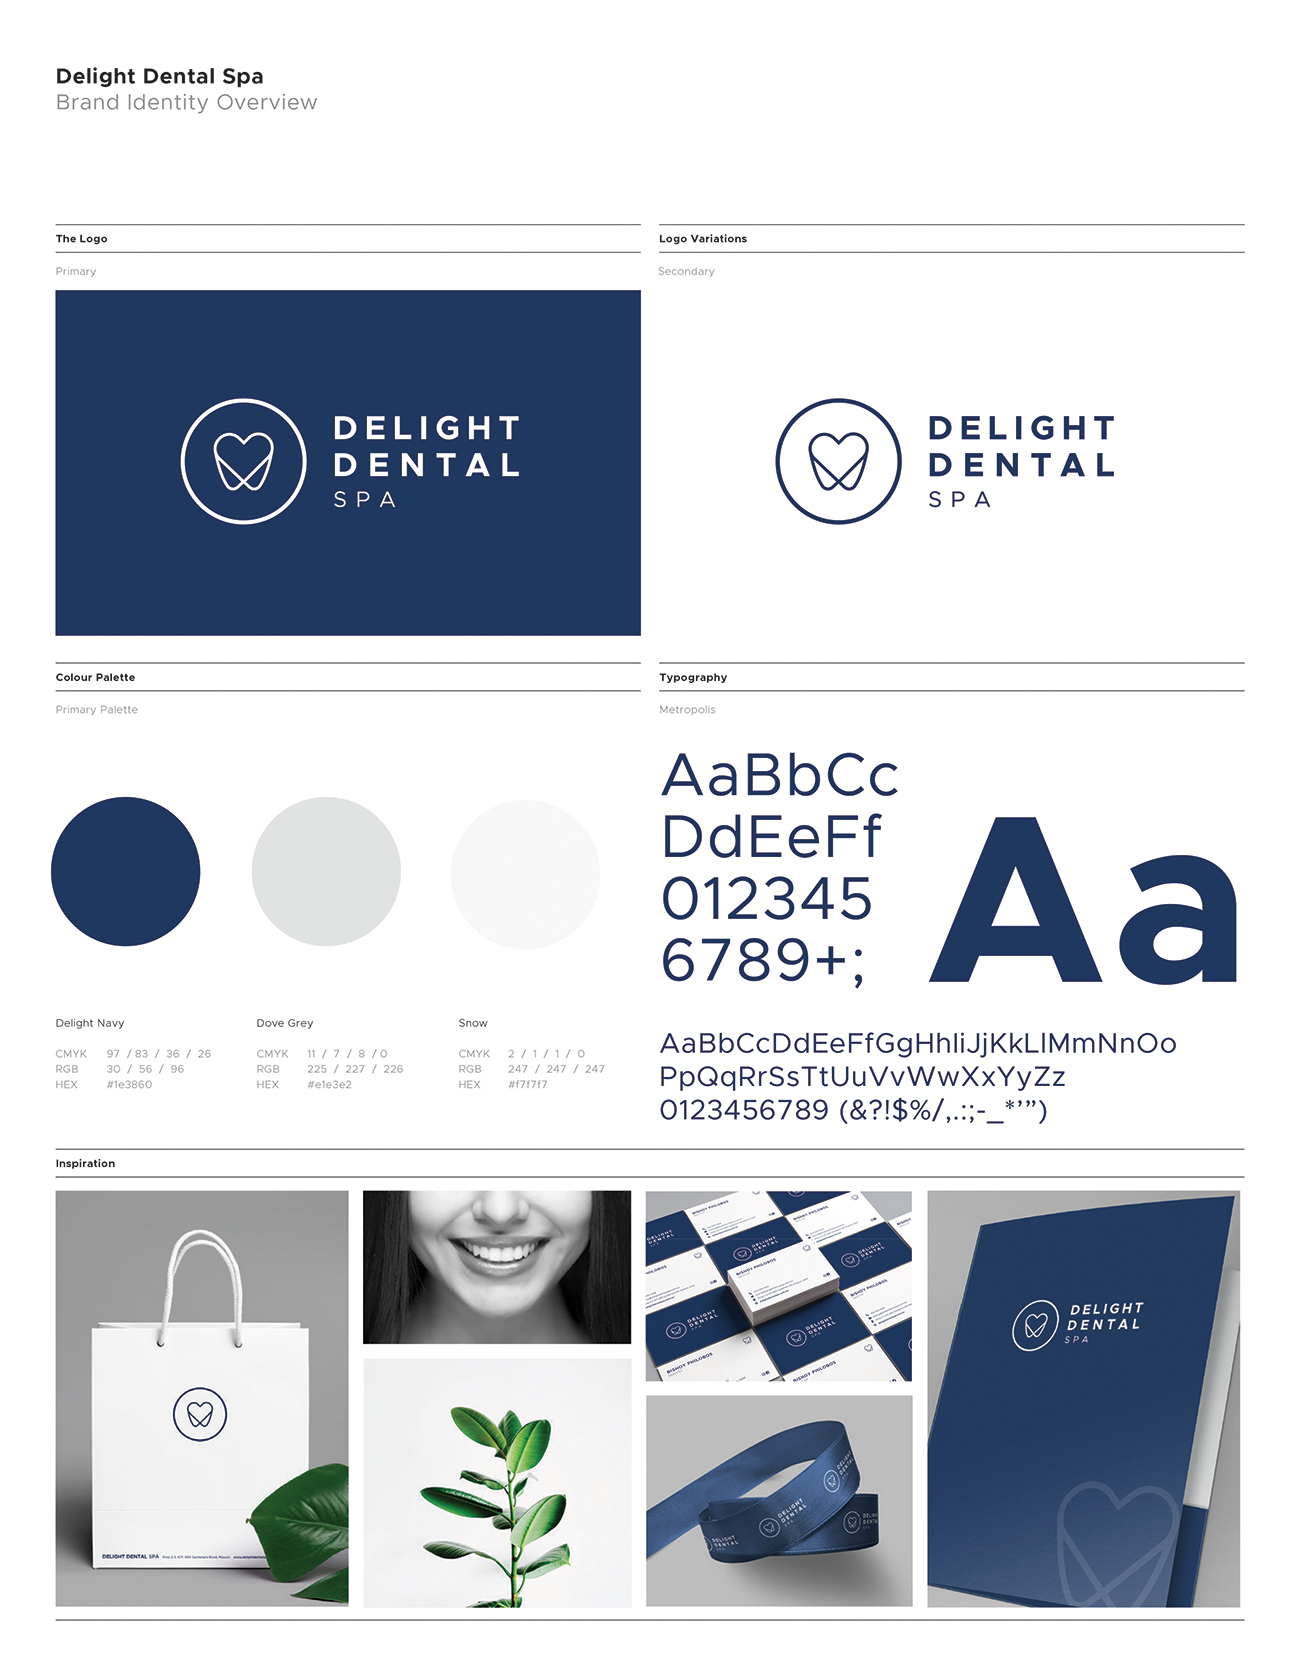 Delight Dental Spa Branding